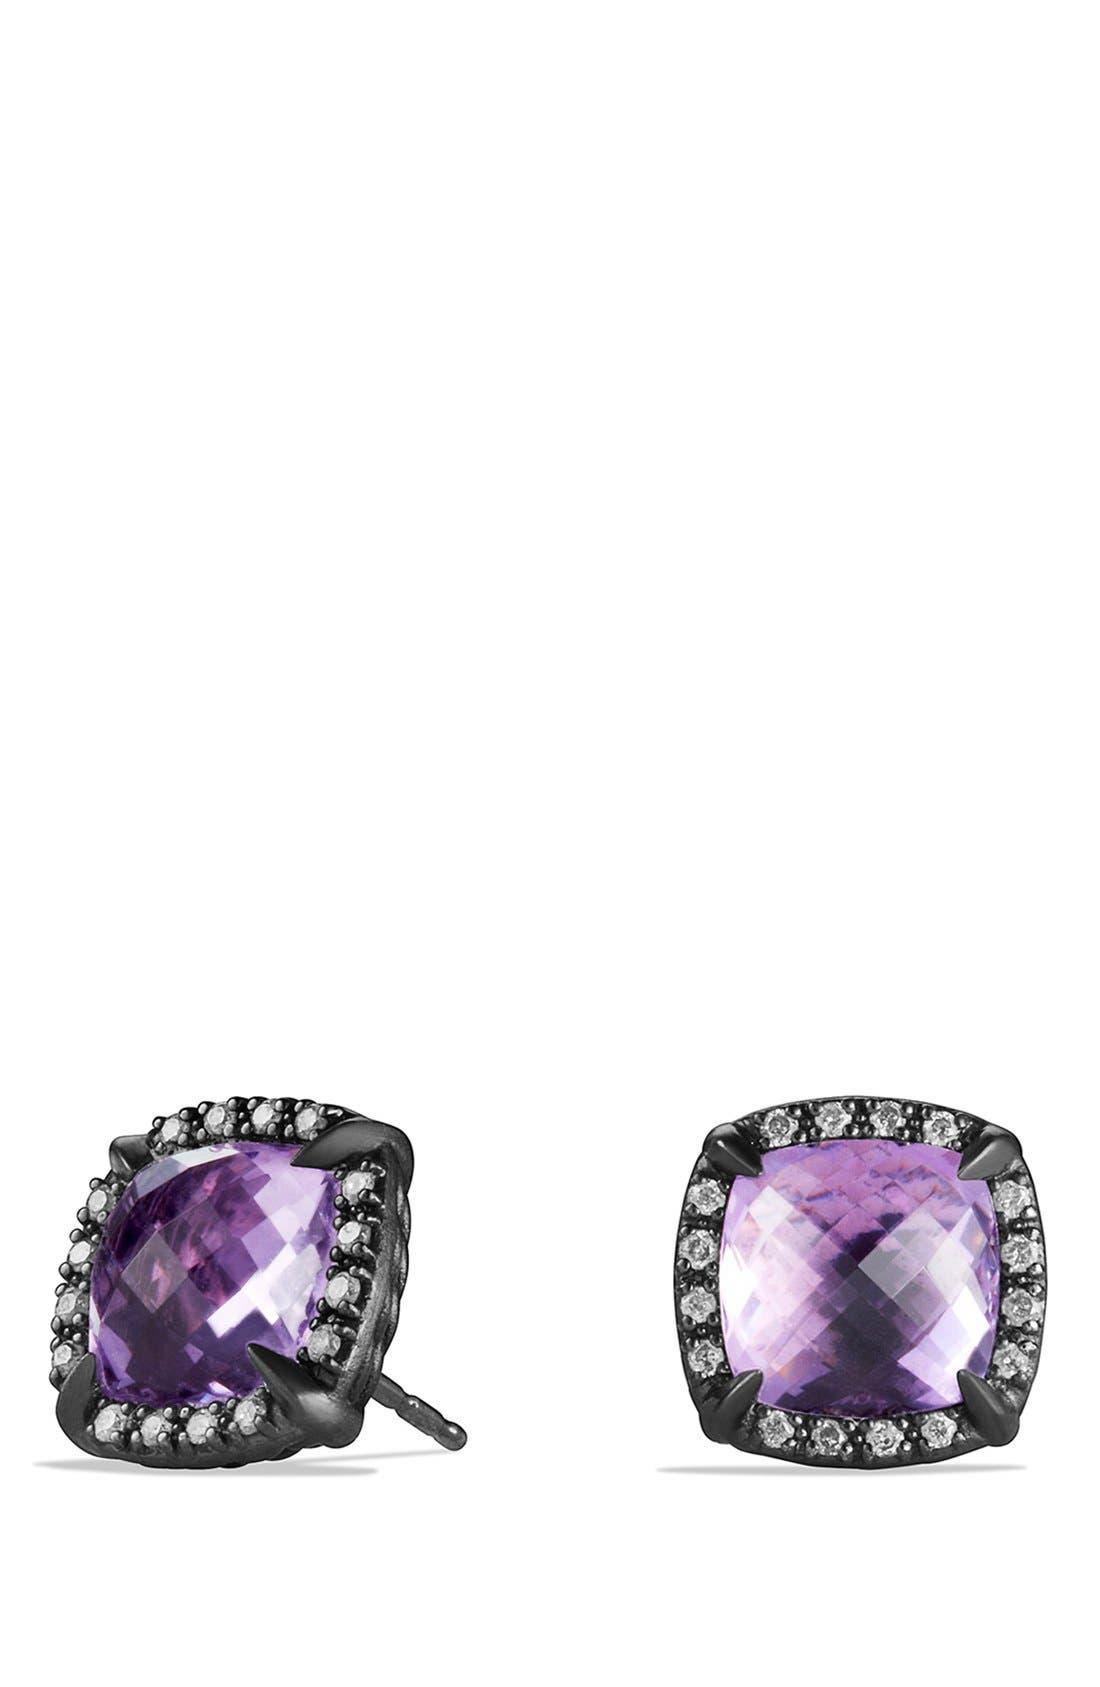 Alternate Image 1 Selected - David Yurman 'Châtelaine' Earrings with Semiprecious Stone and Diamonds